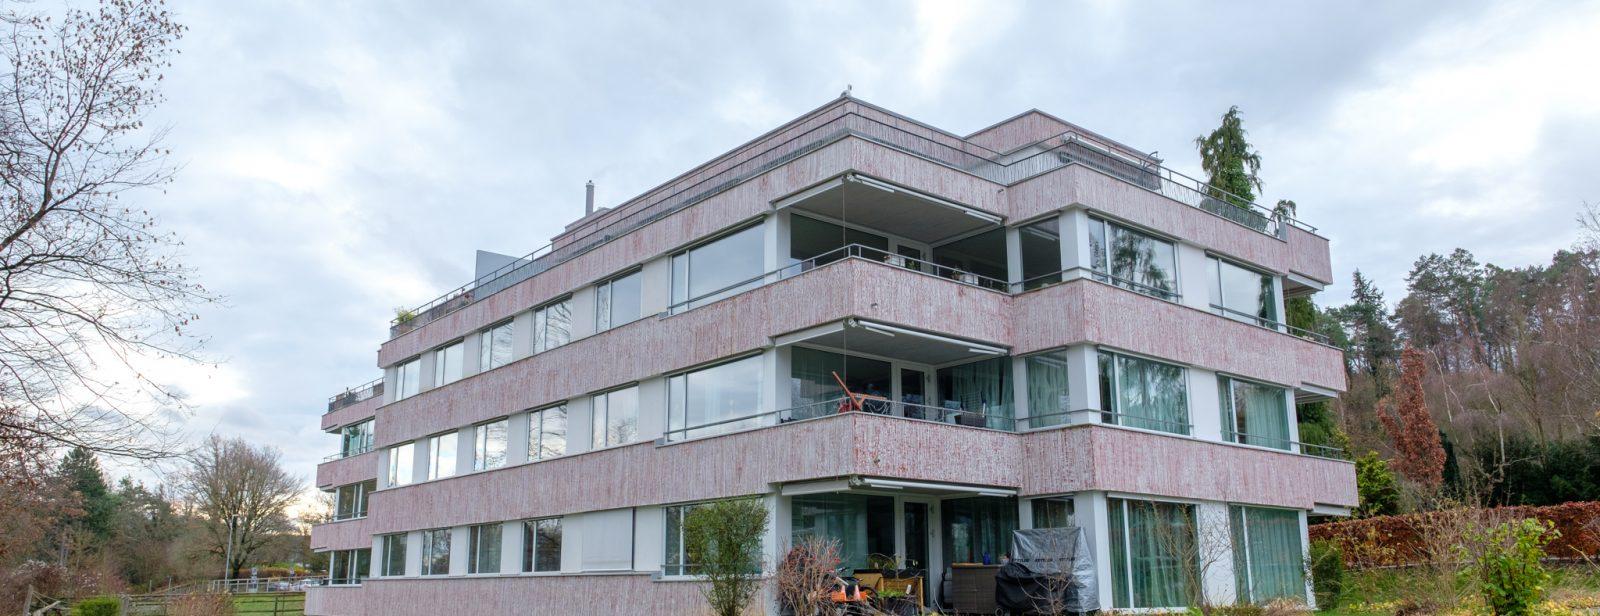 MFH Guggenbühlstrasse, Dietikon